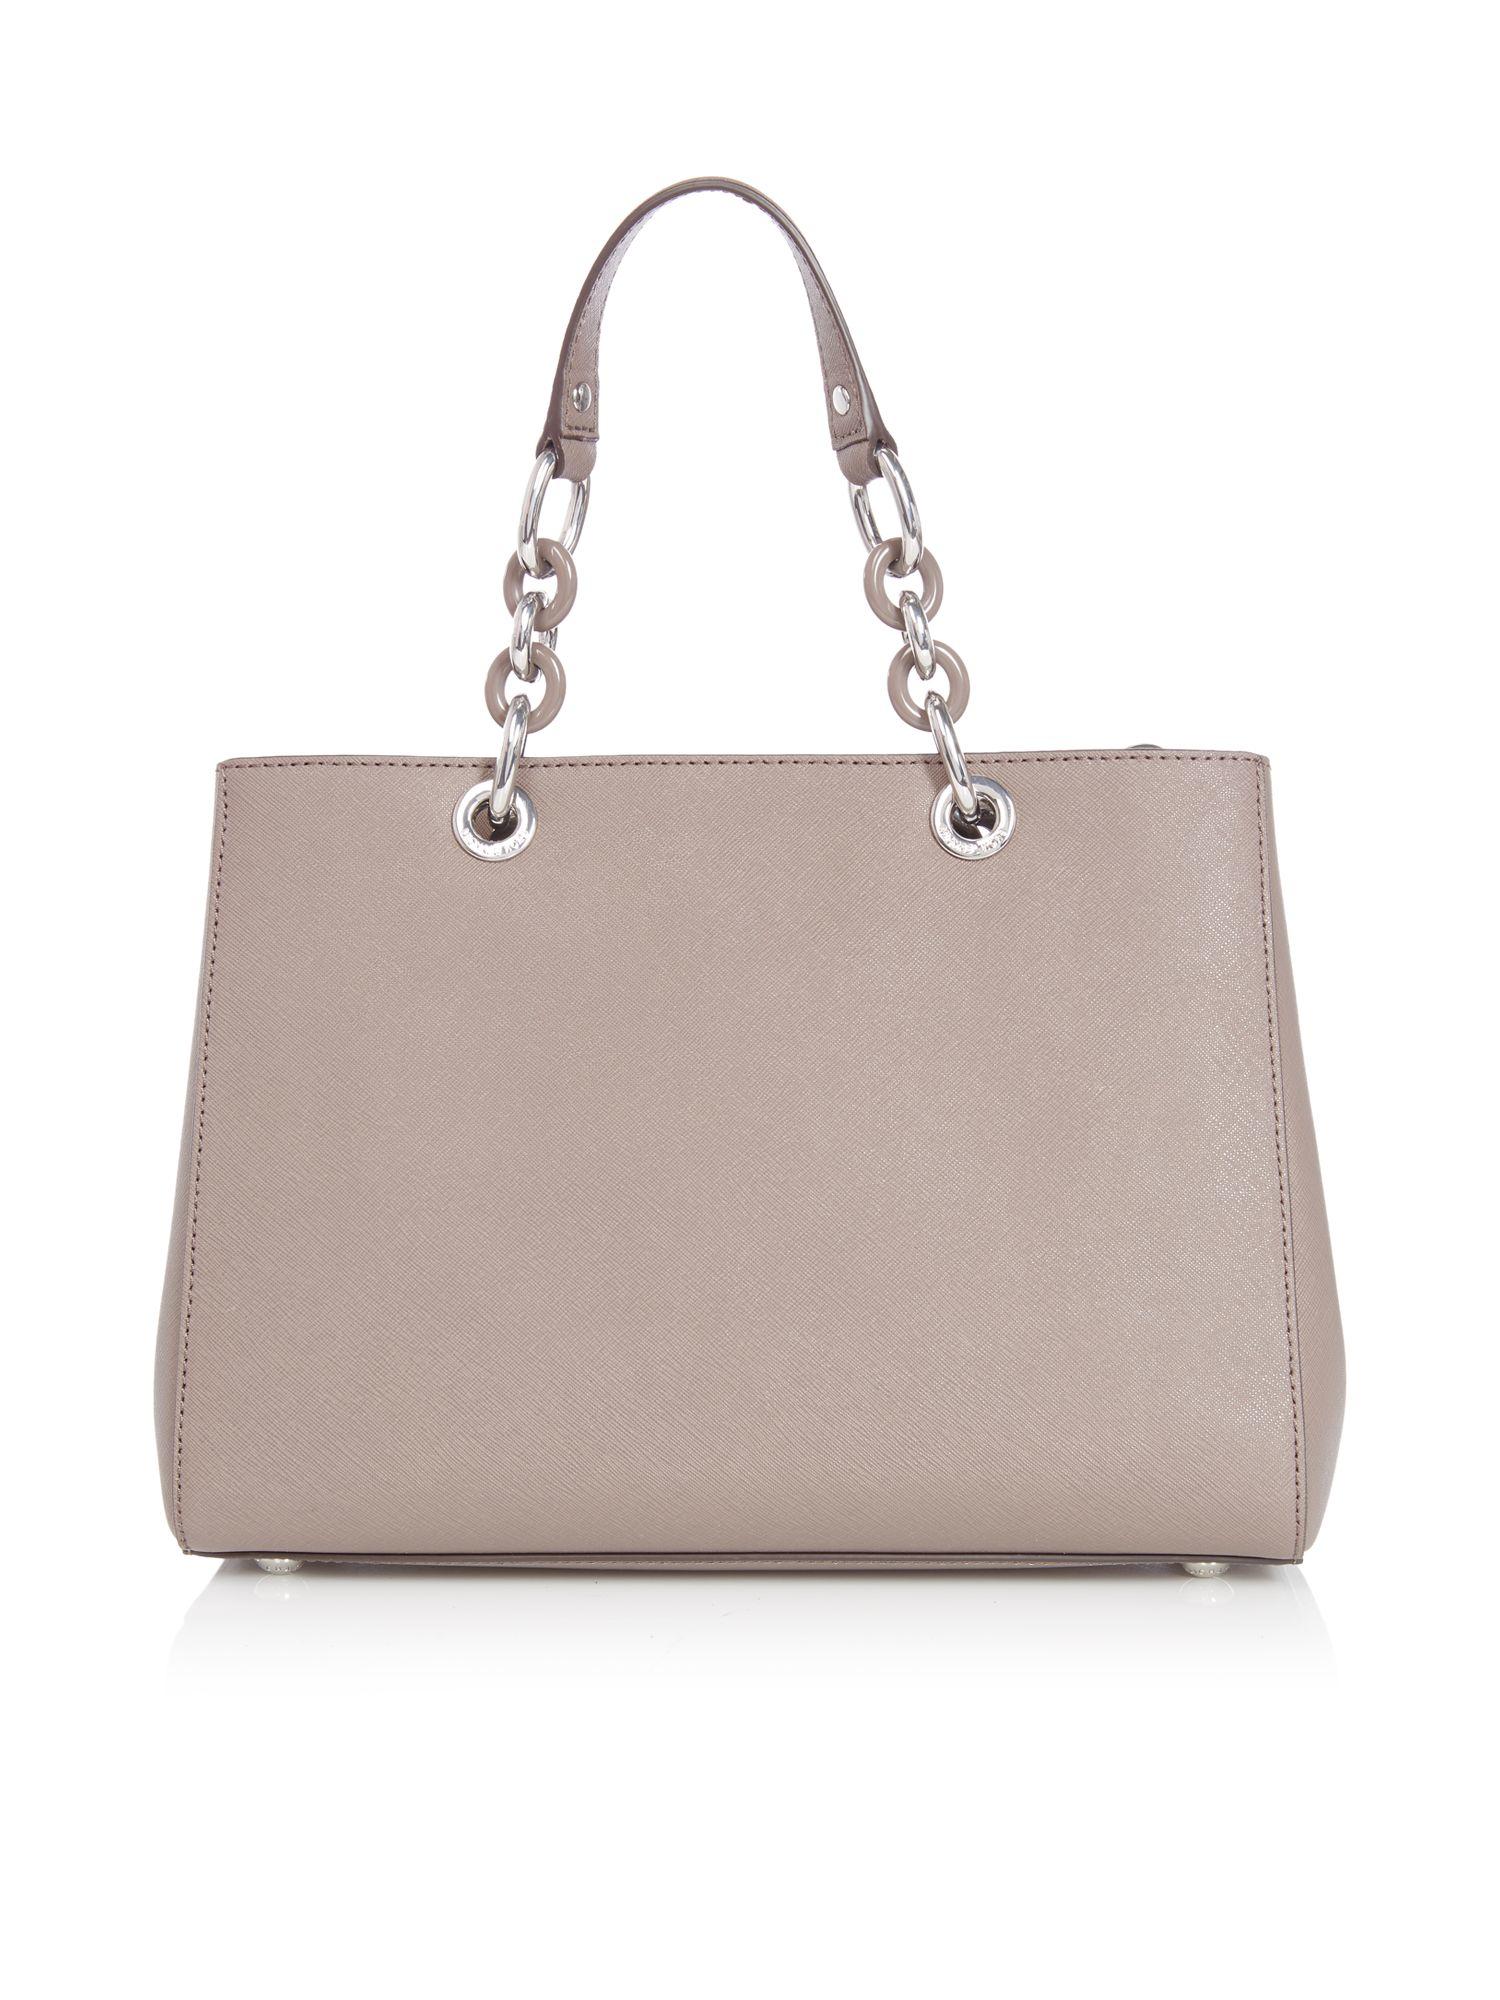 Michael Kors Cynthia Taupe Tote Bag in Brown